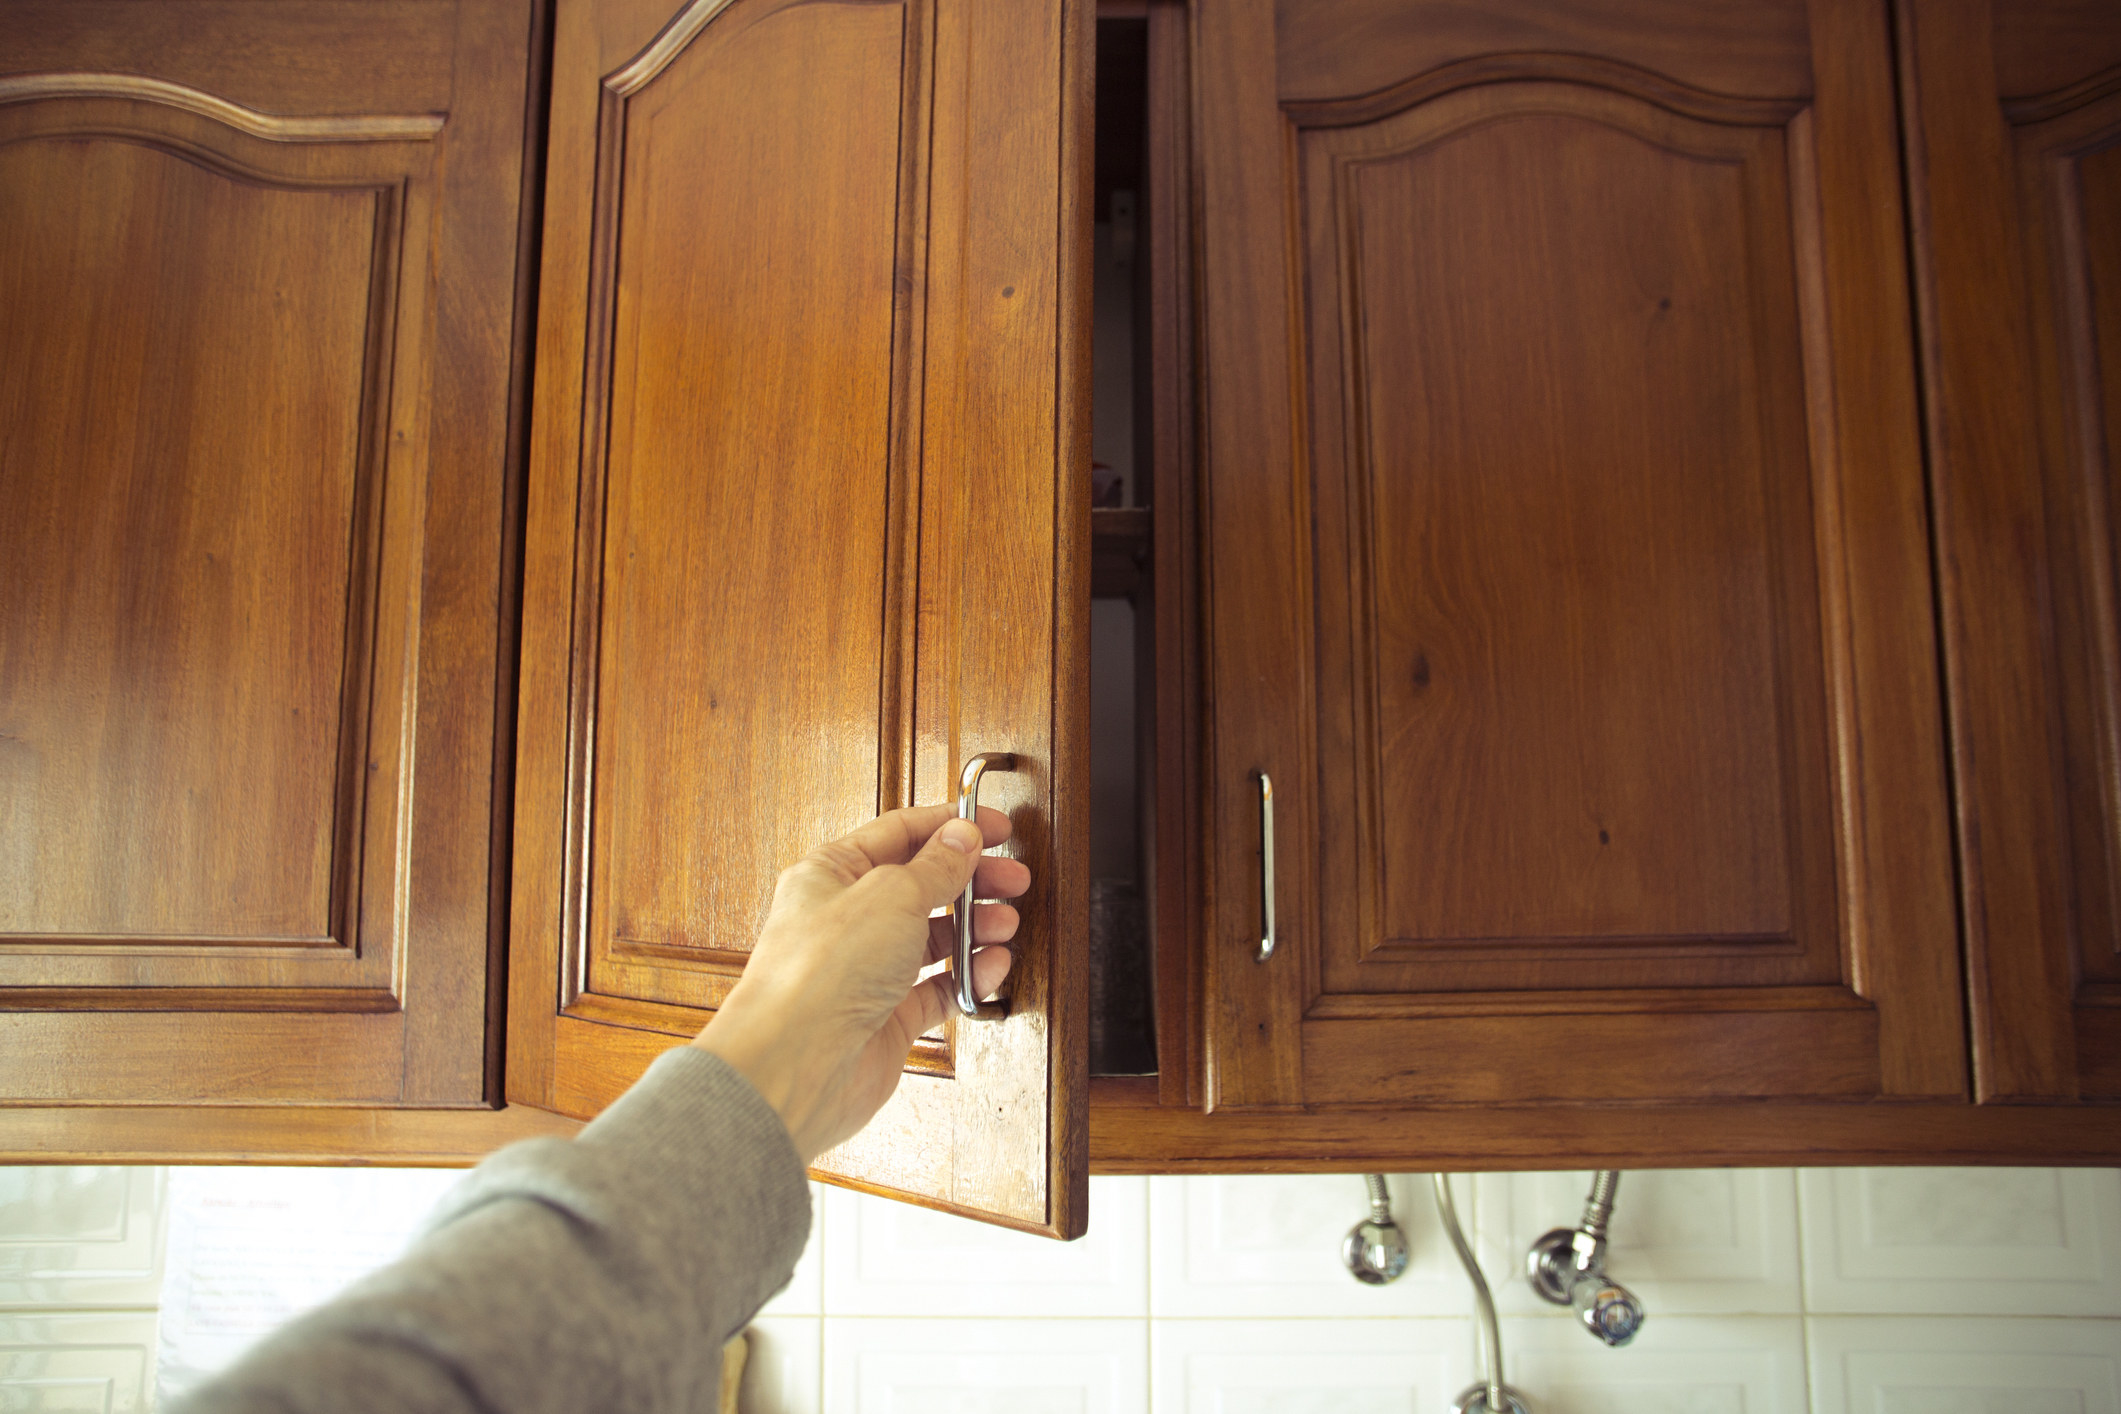 A hand opening an upper cabinet door